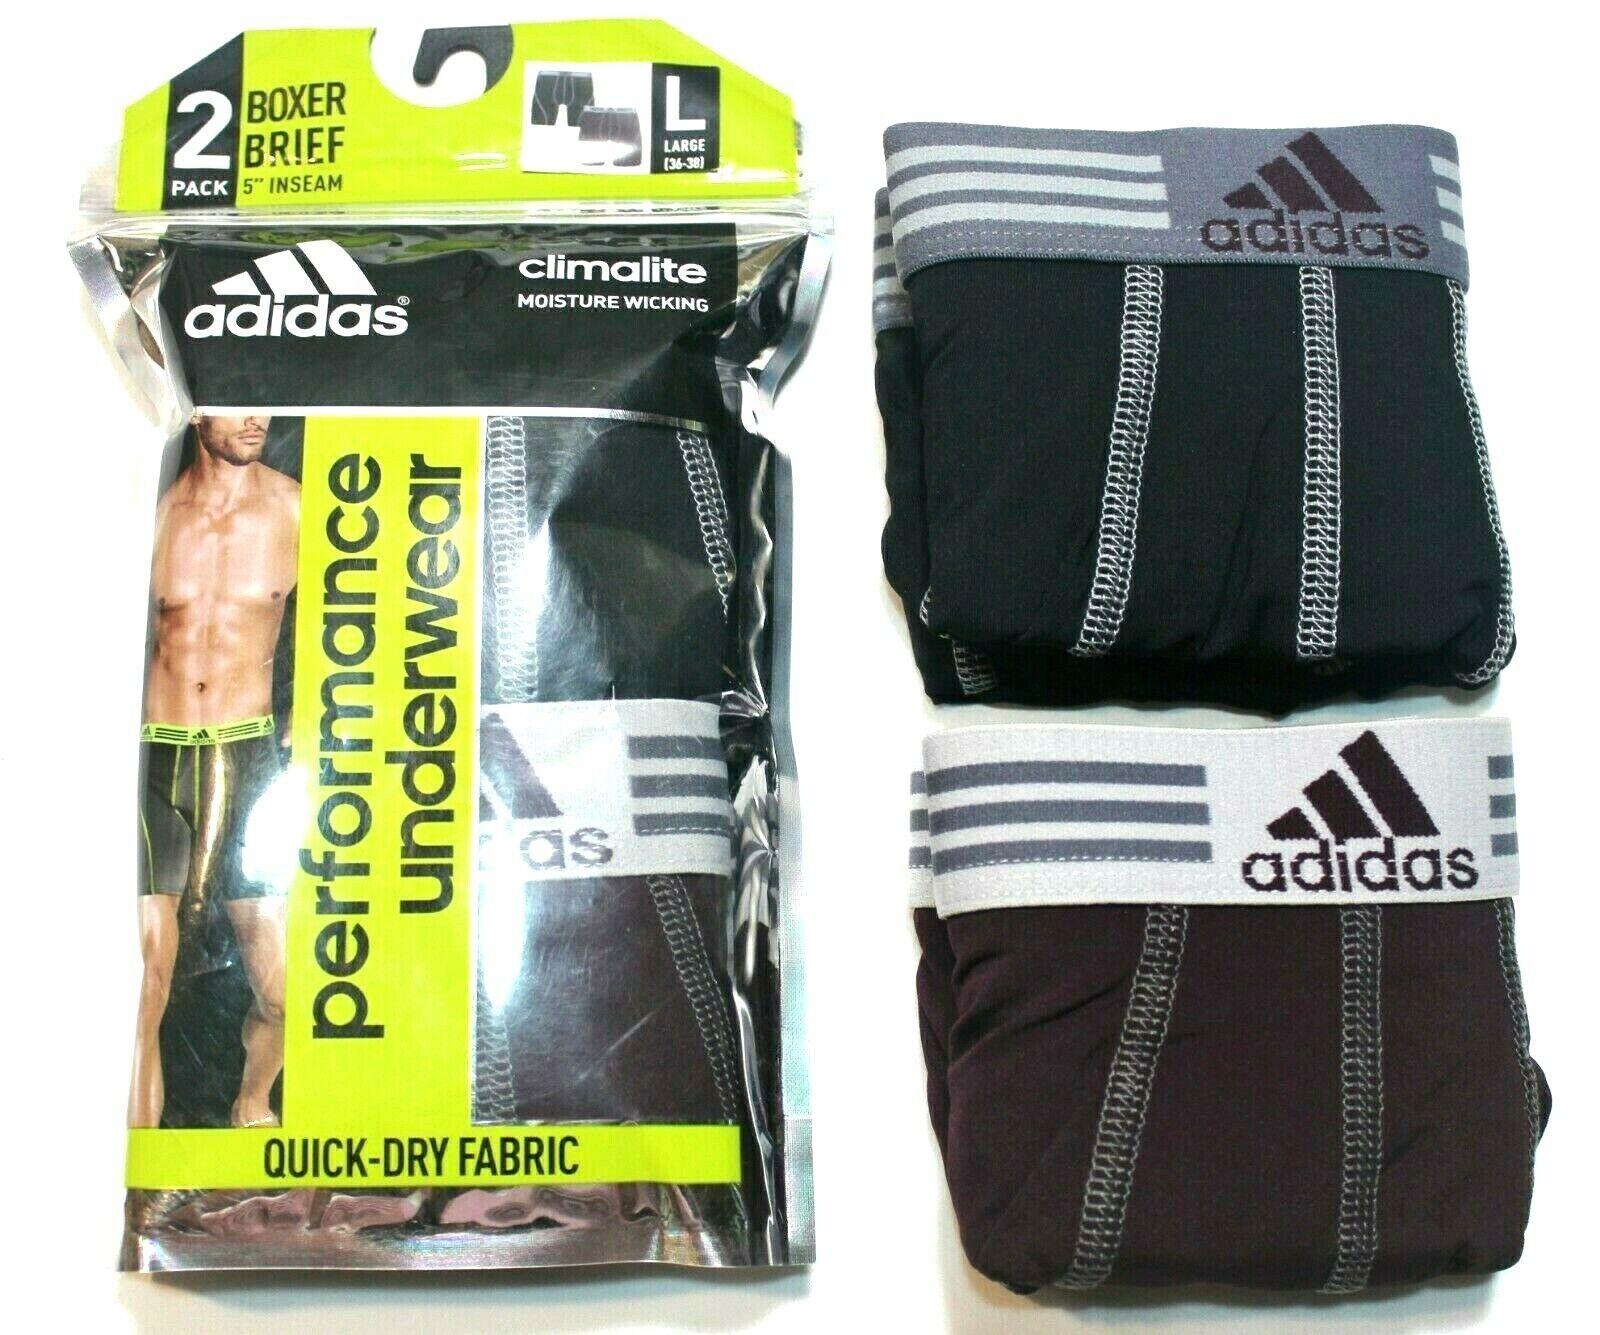 8bbcfdf20 neu adidas herren sport performance 2 pack